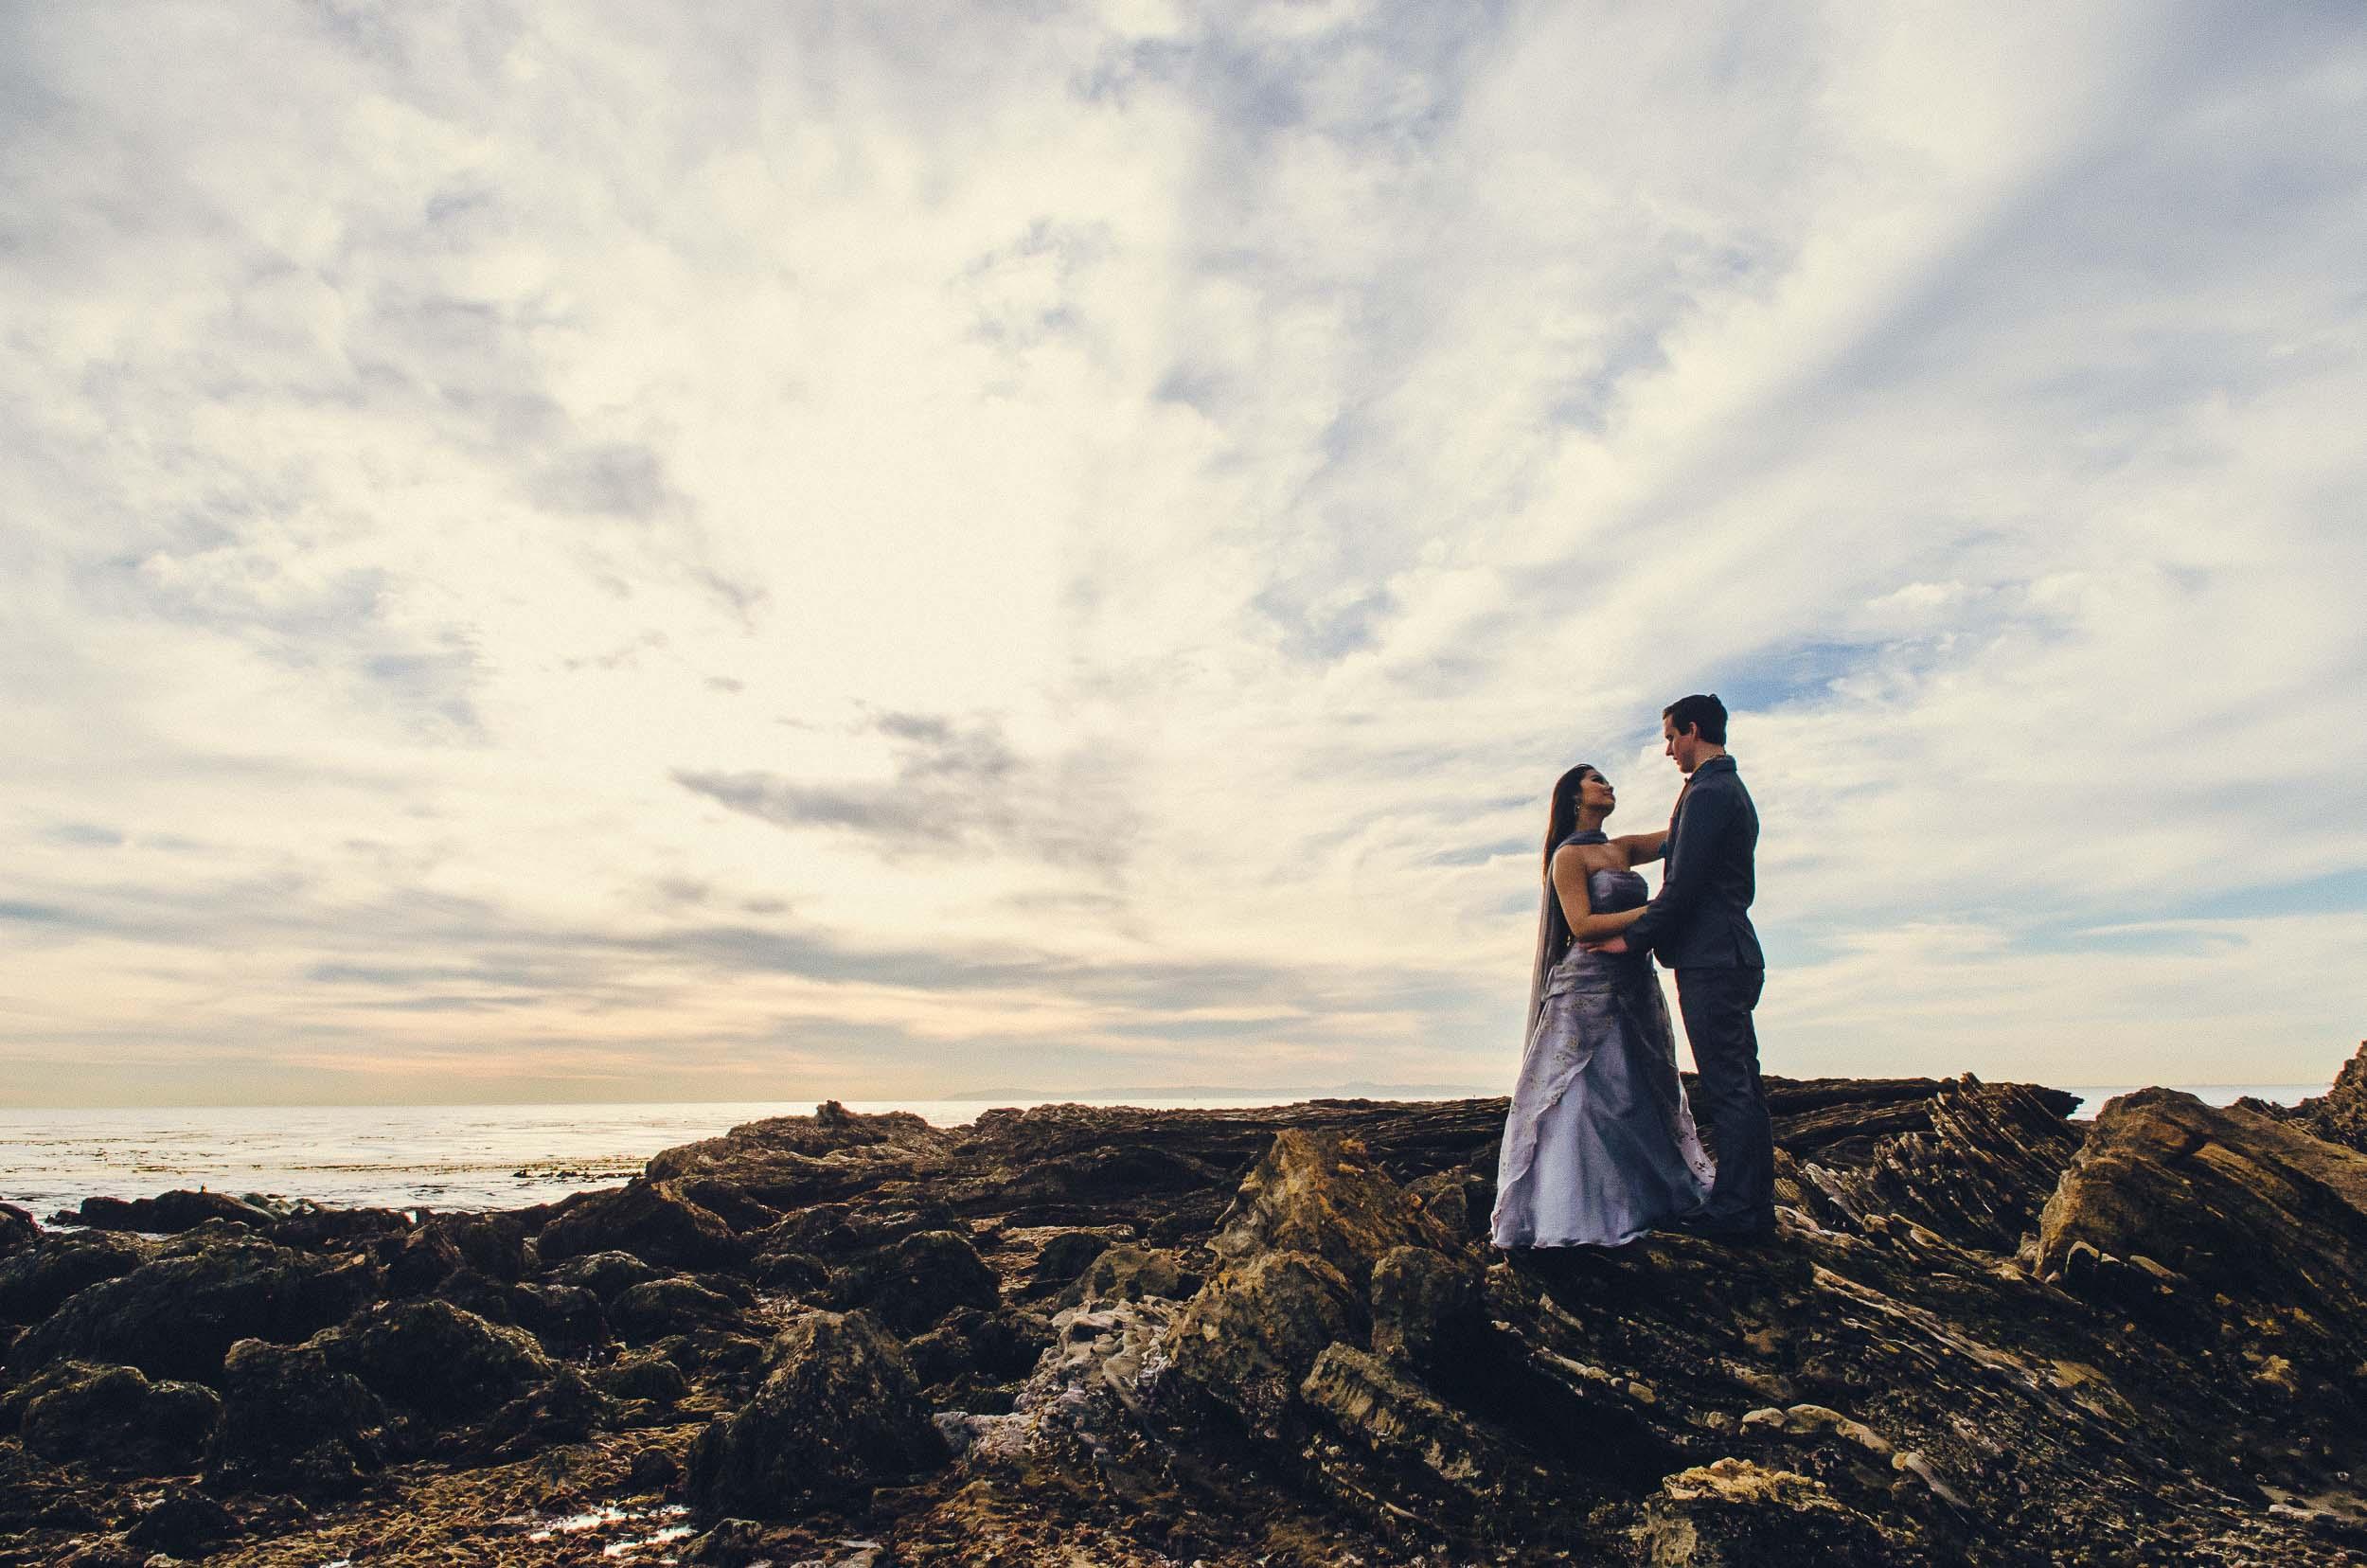 Bryan-Miraflor-Photography-Jackie-Ryan-Beach-Couple-Photoshoot-20131215-0022-1.jpg